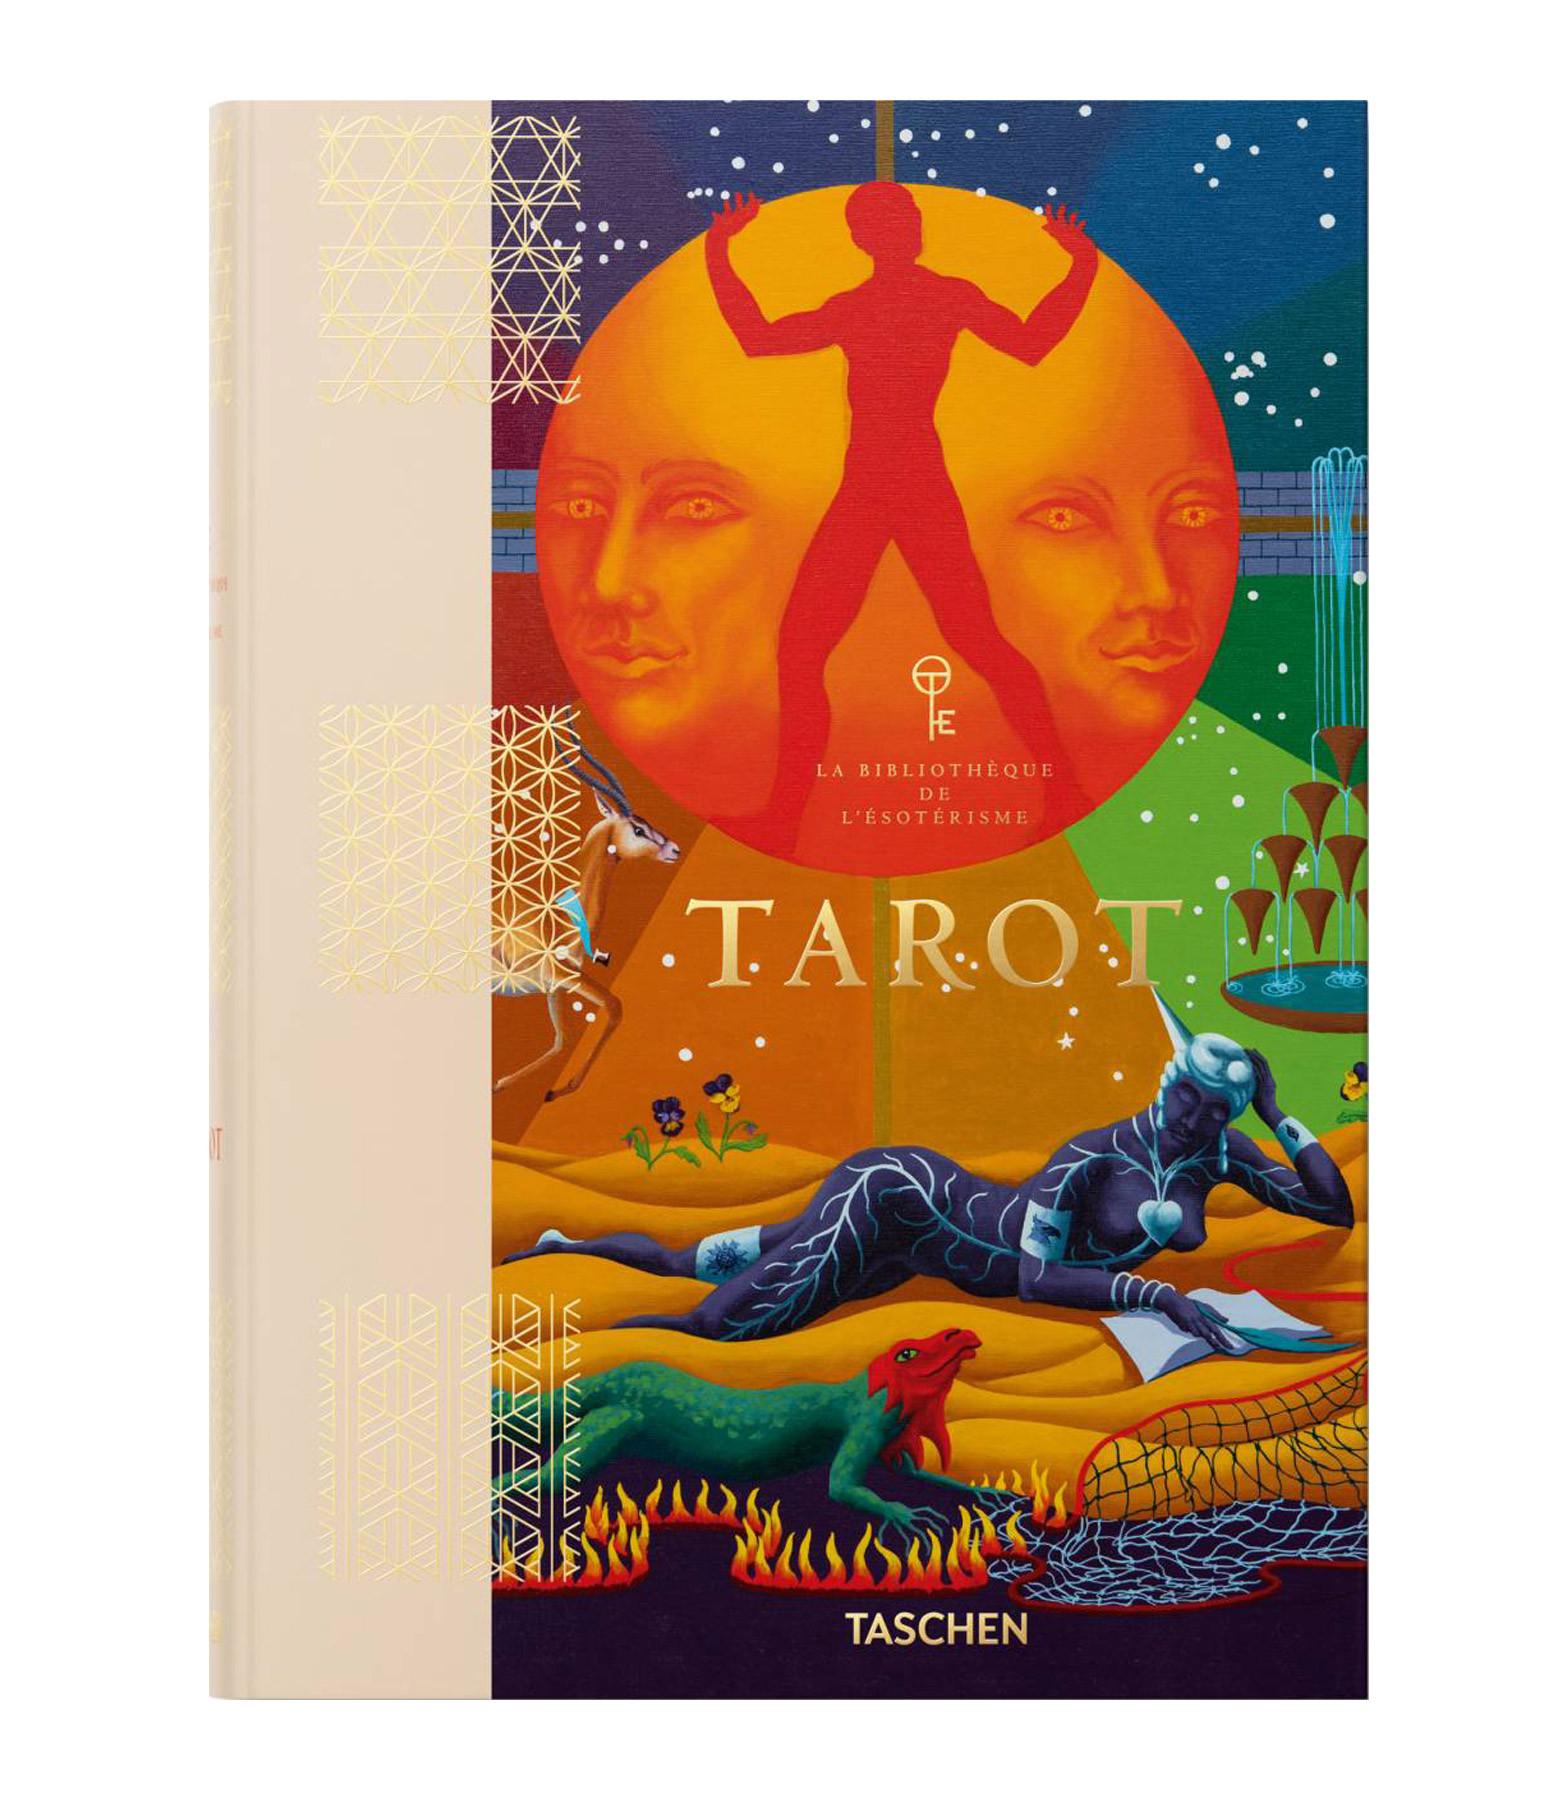 TASCHEN - Livre Tarot, La Bibliothèque de l'Esotérisme